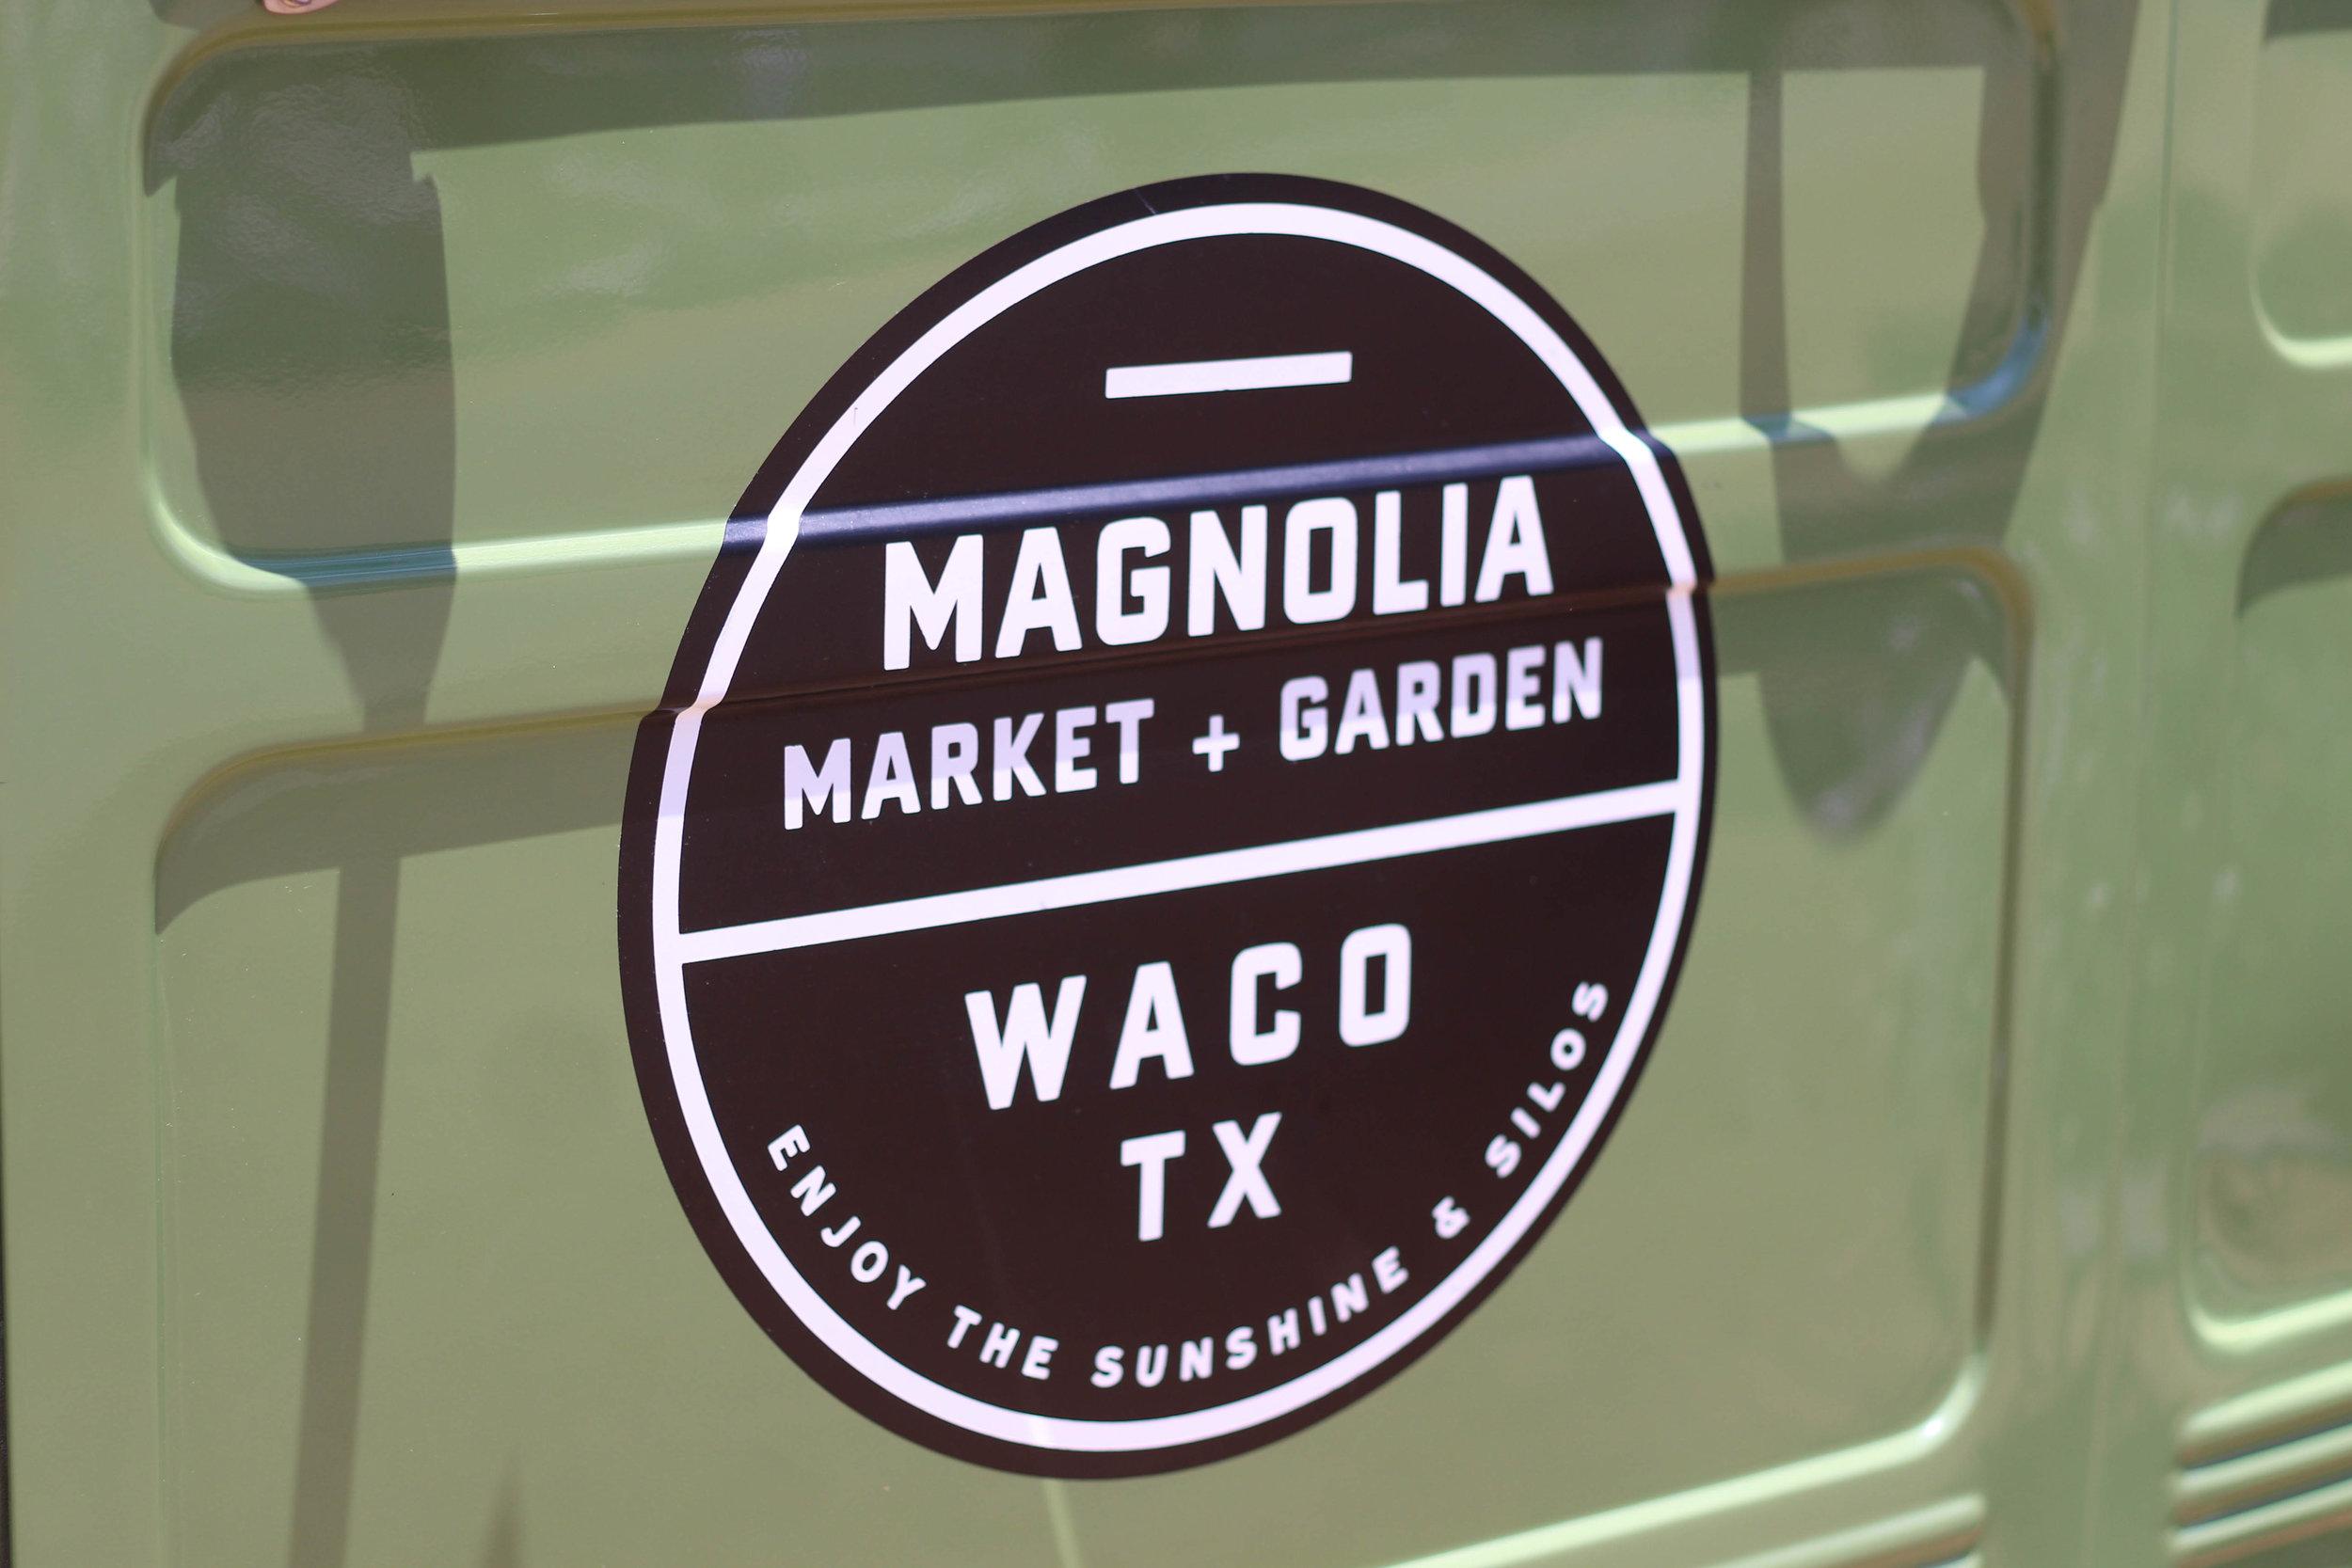 Waco-10.jpg